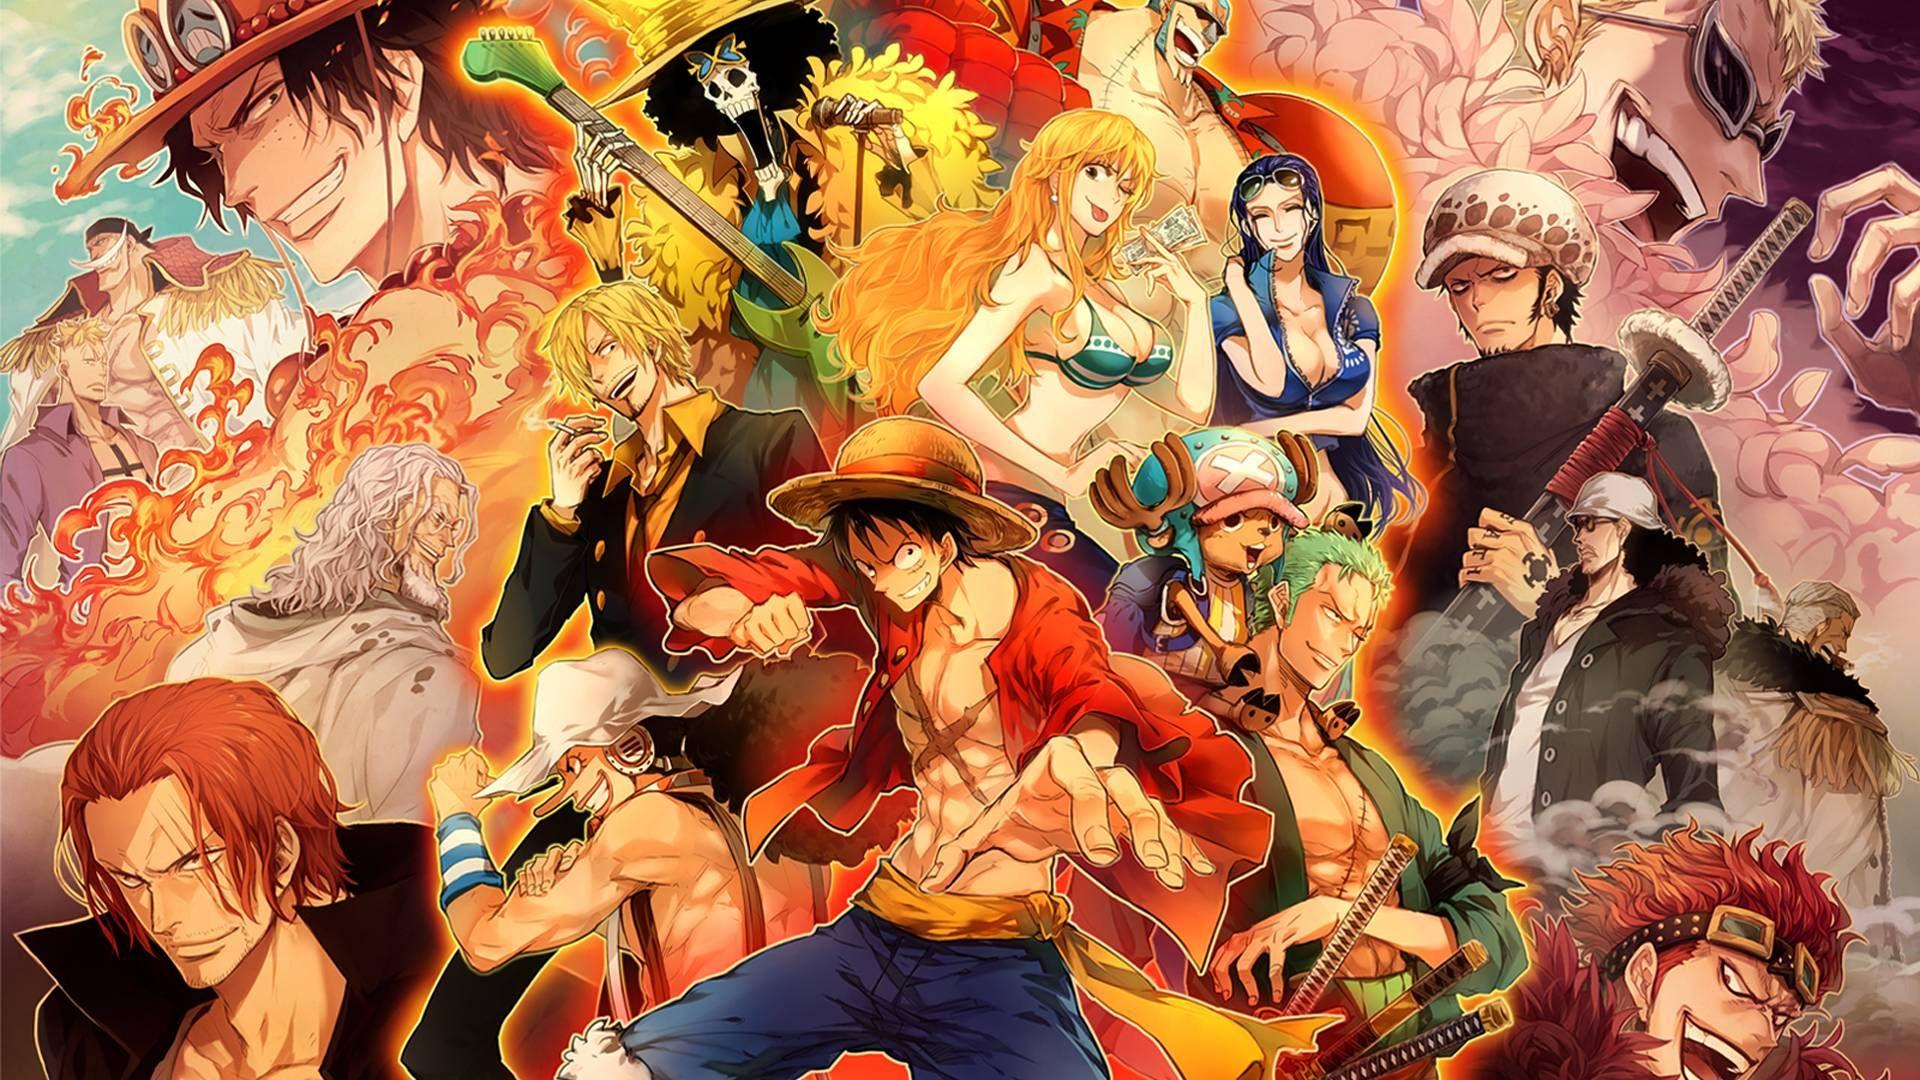 One Piece Crew New World Desktop Wallpaper 268 Foolhardi One Piece New World One Piece Manga One Piece Images